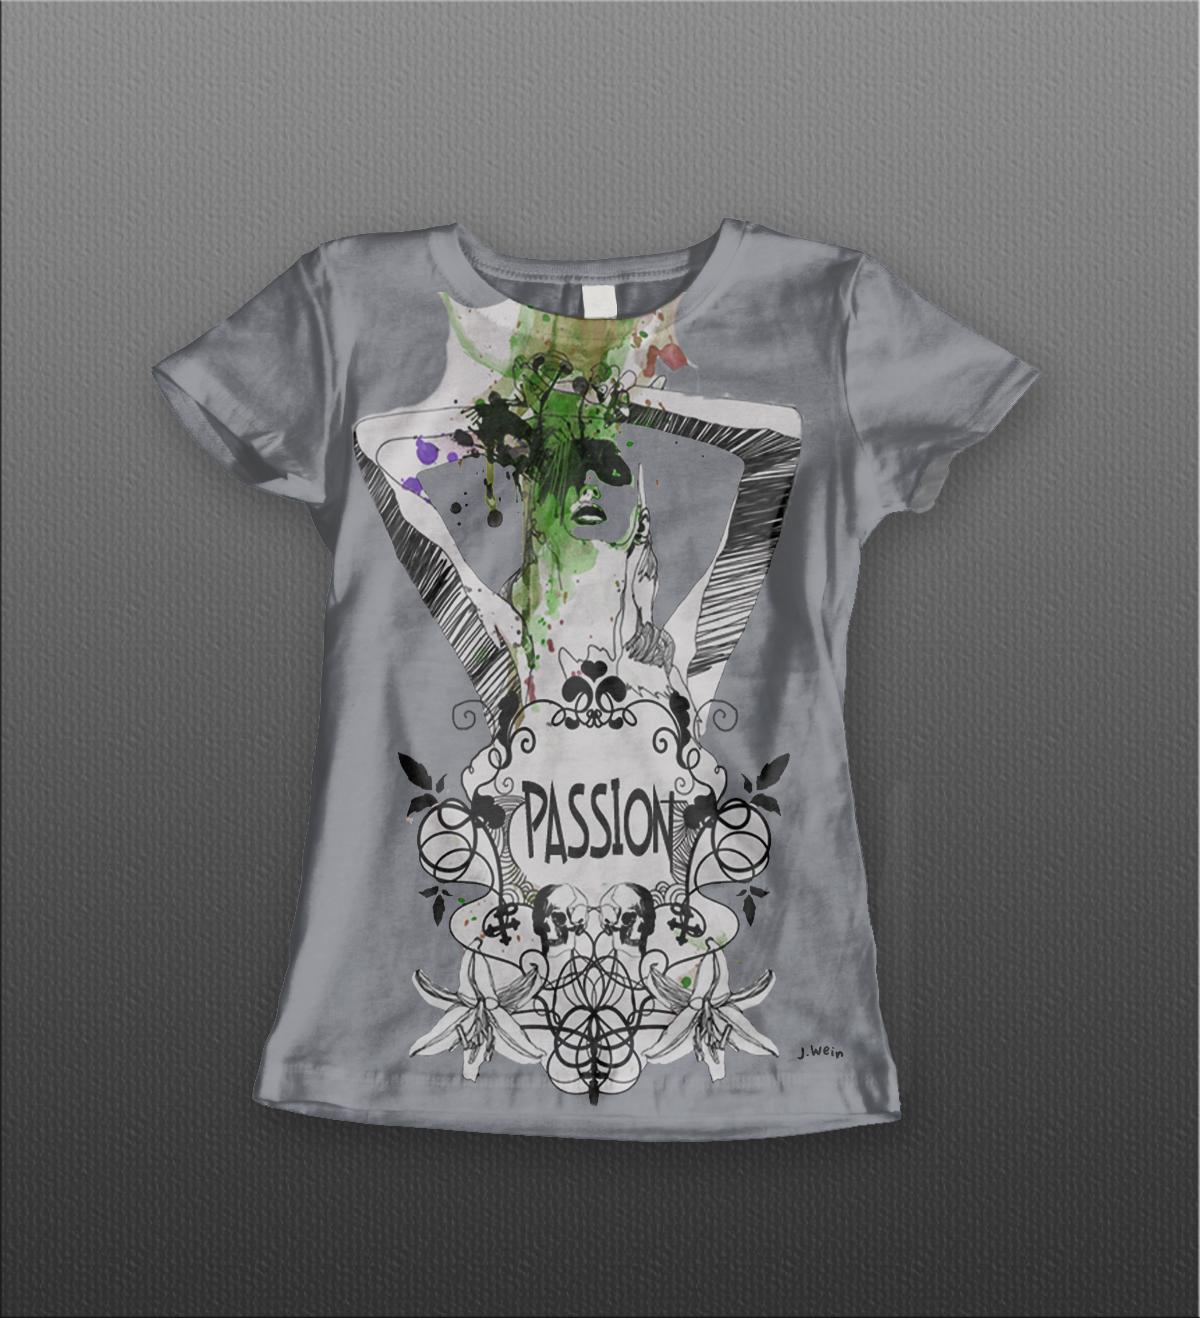 passion_graytee.jpg